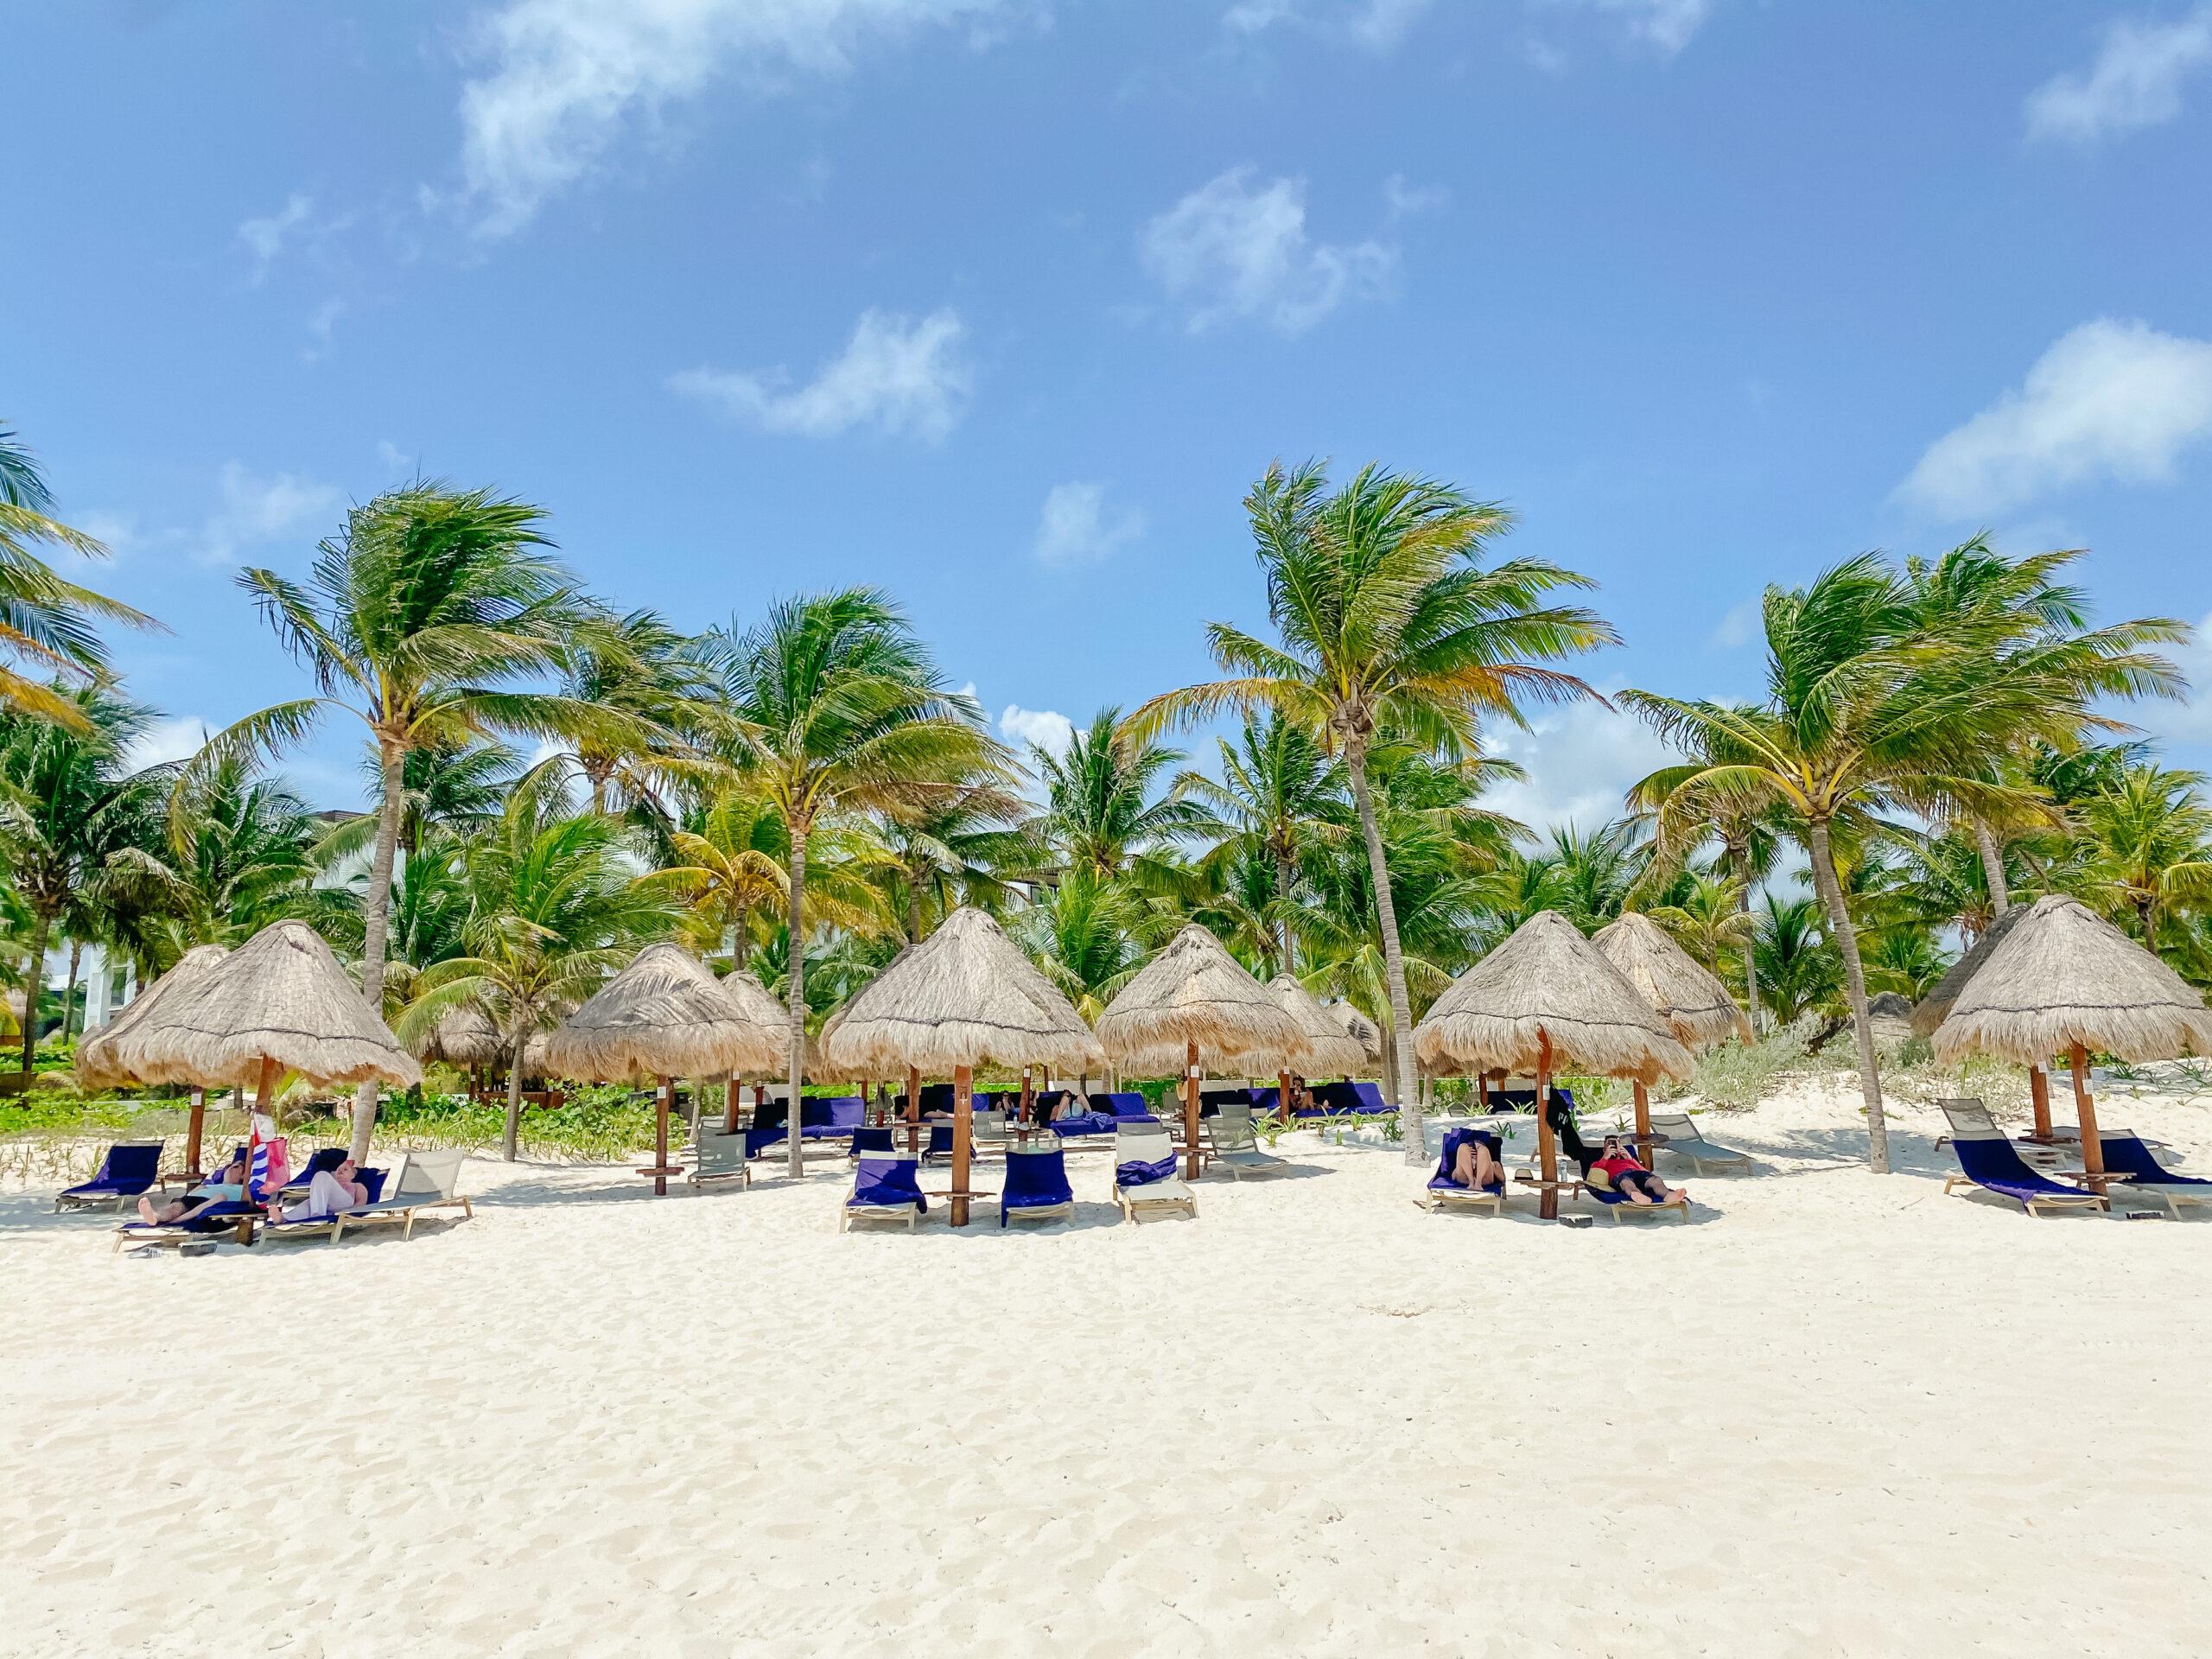 MEXICO RESORTS, MEXICO BEACHES, FINEST RESORT BEACHES